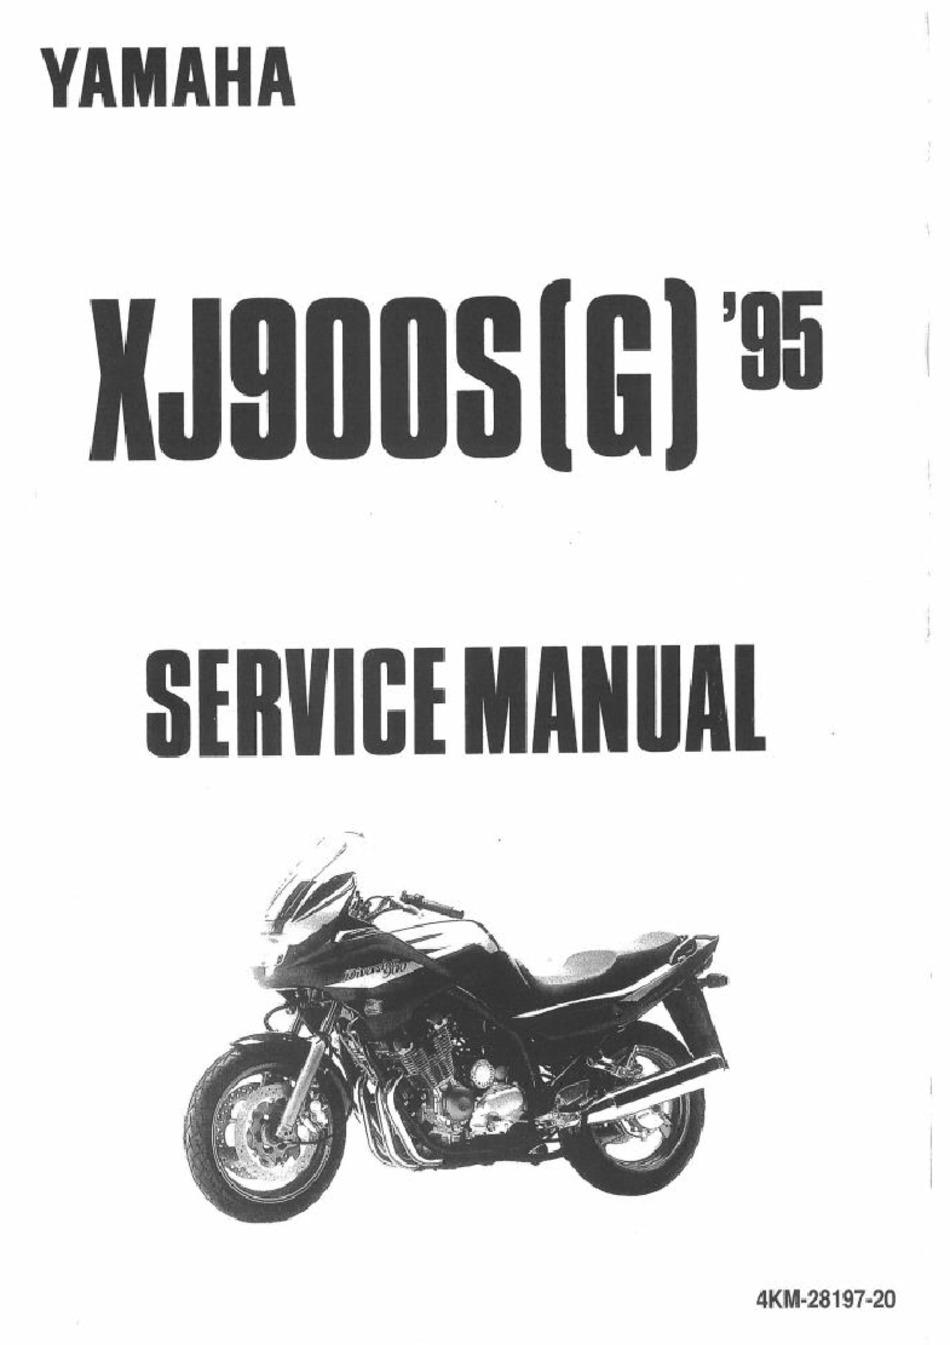 Yamaha 95 Xj900s Service Manual Pdf Download Manualslib